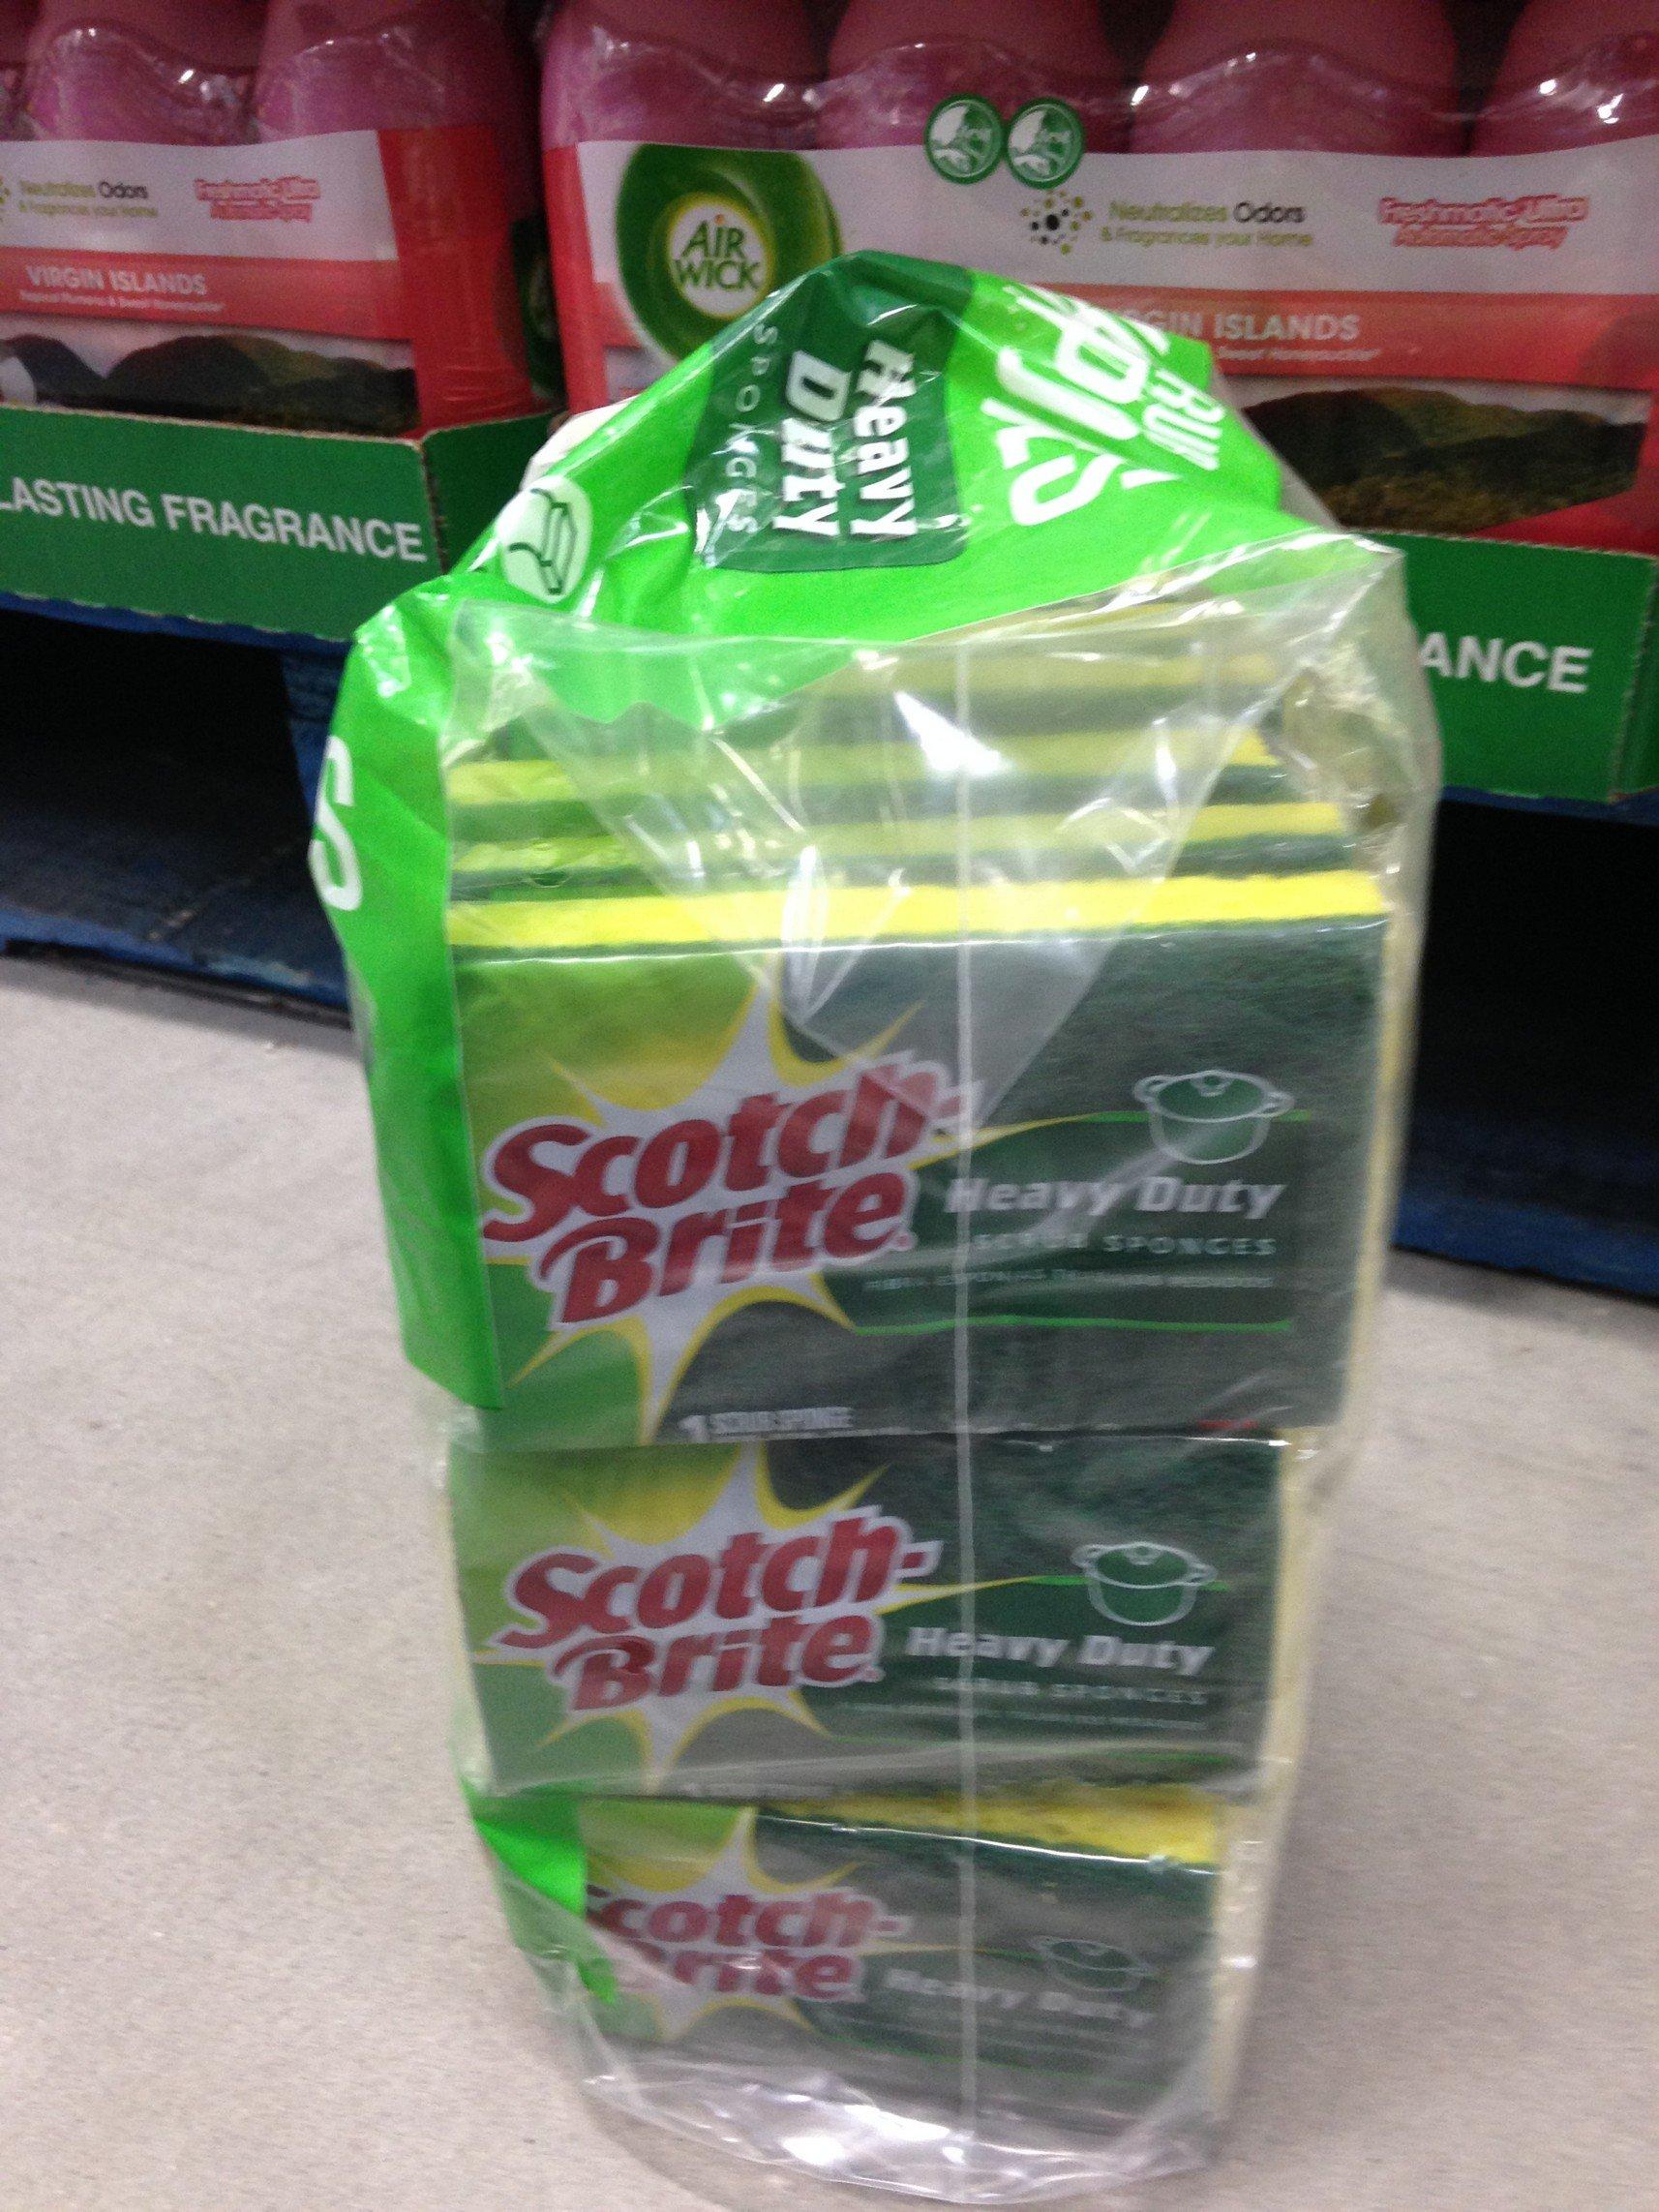 Scotch- Brite heavy duty kitchen sponges 18 pk (pack of 6) by Scotch-Brite